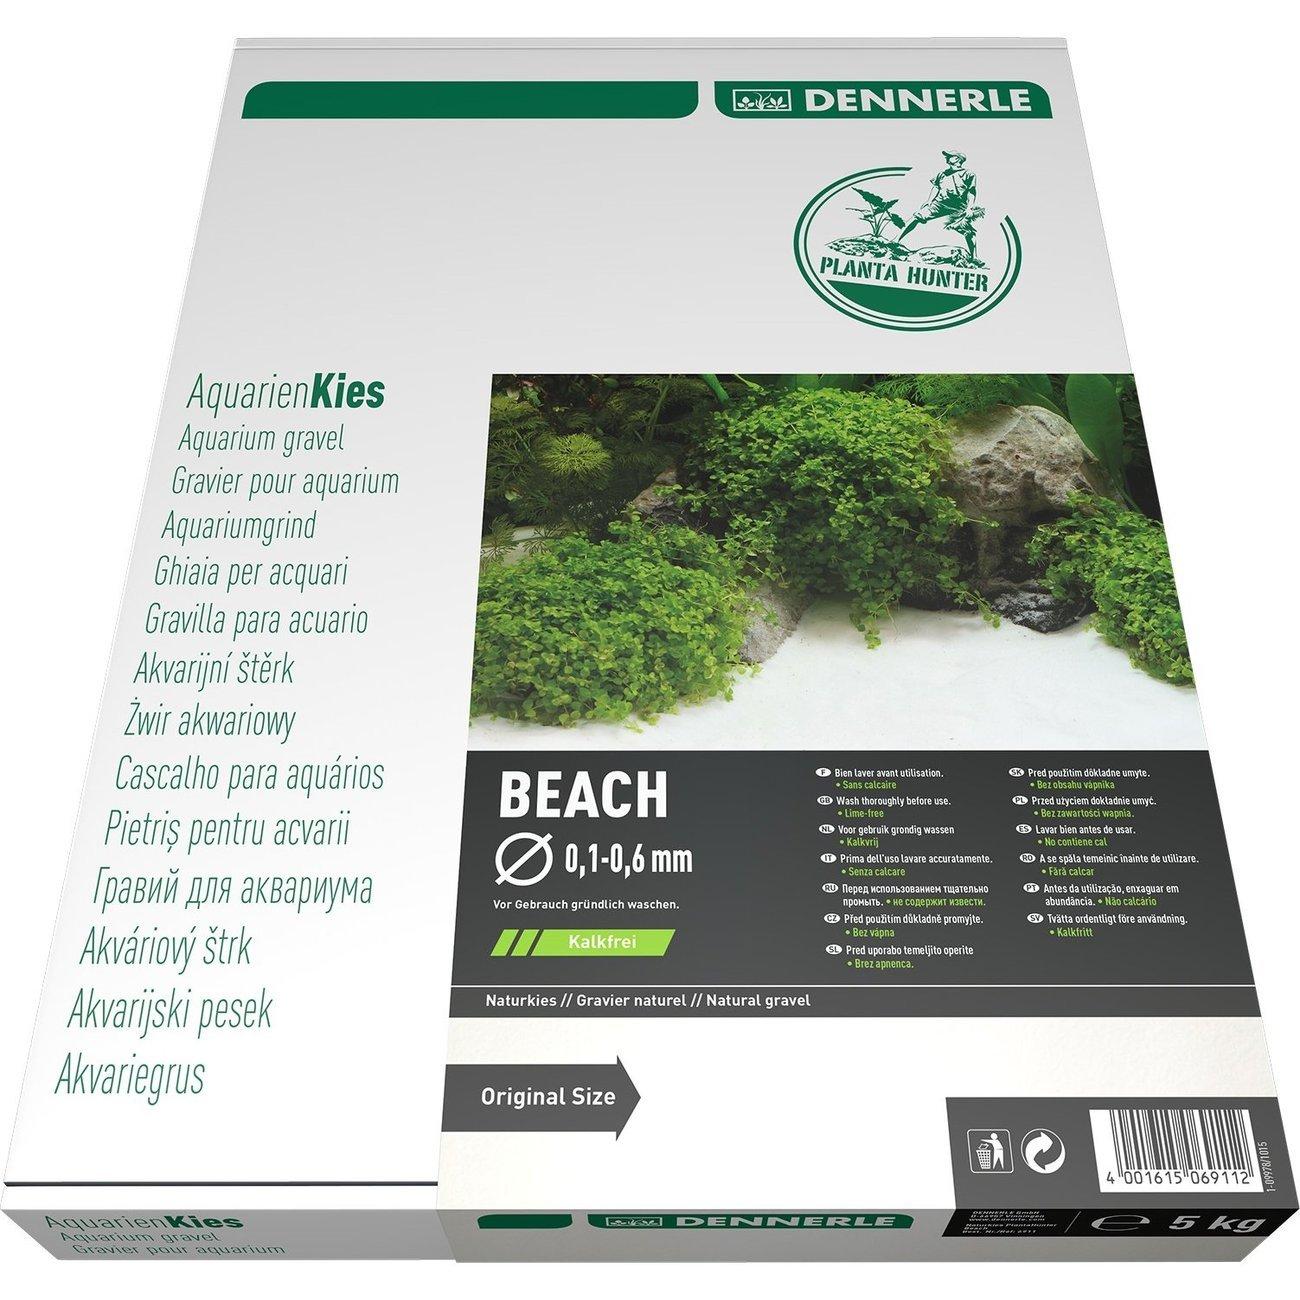 Dennerle Plantahunter-Kies Beach